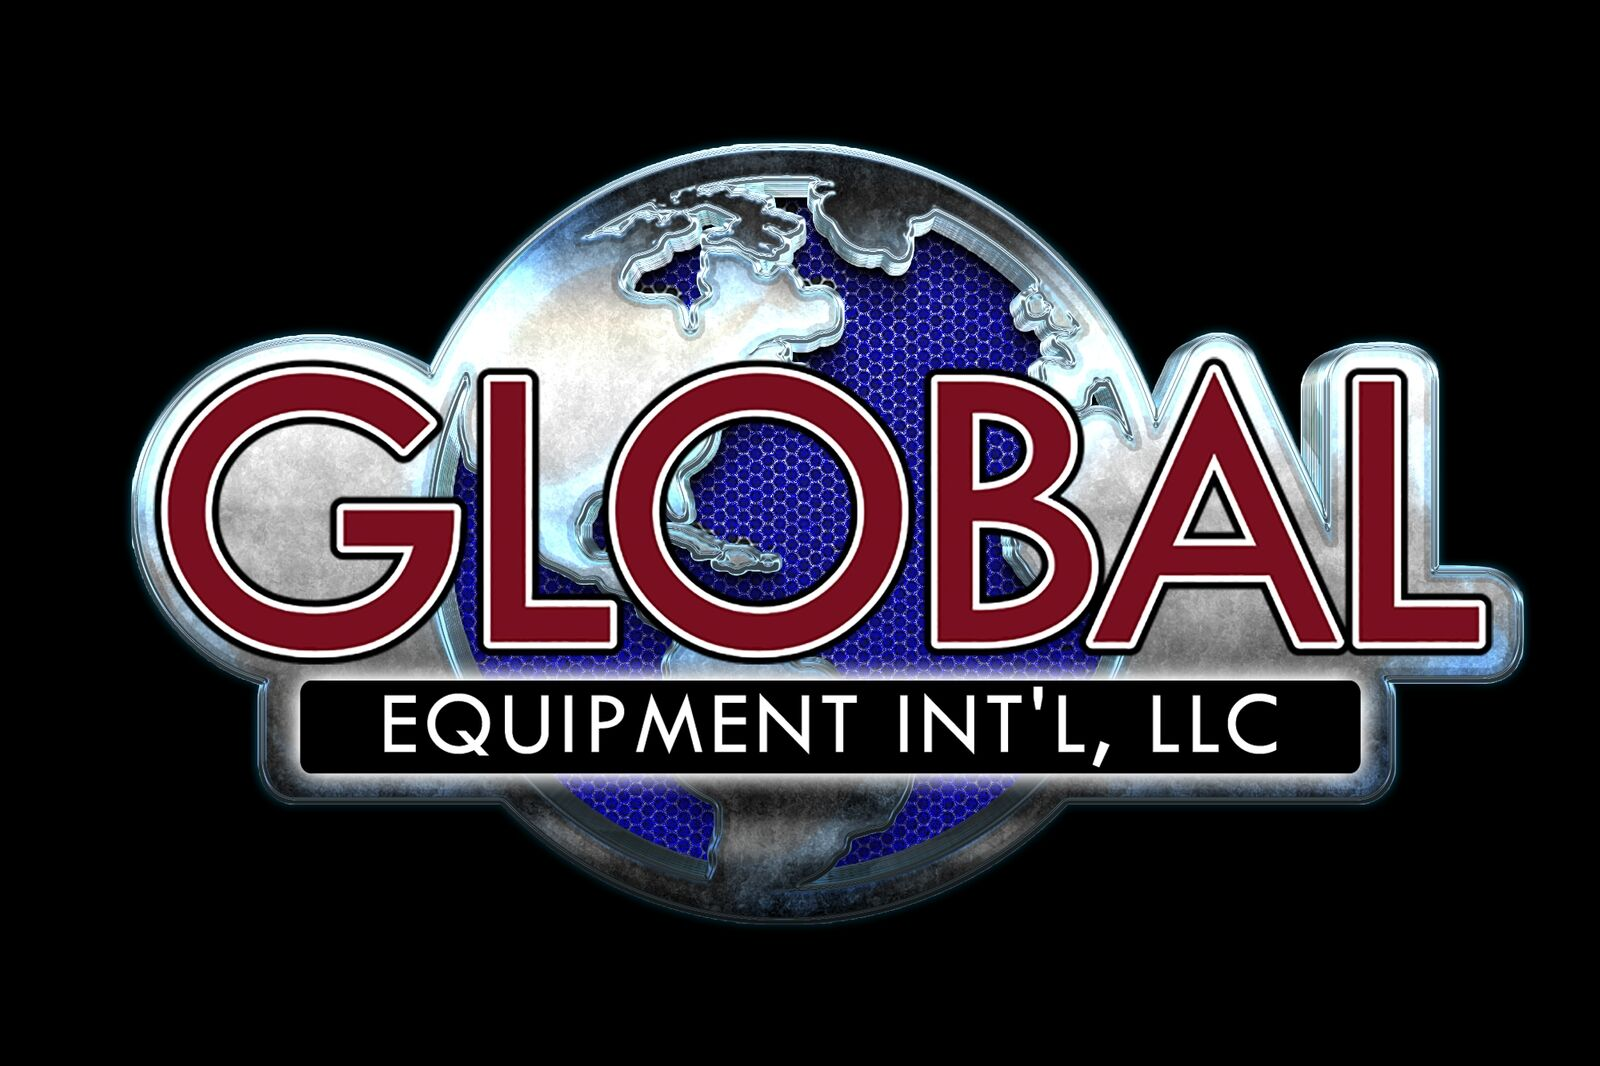 Global Equipment International, LLC